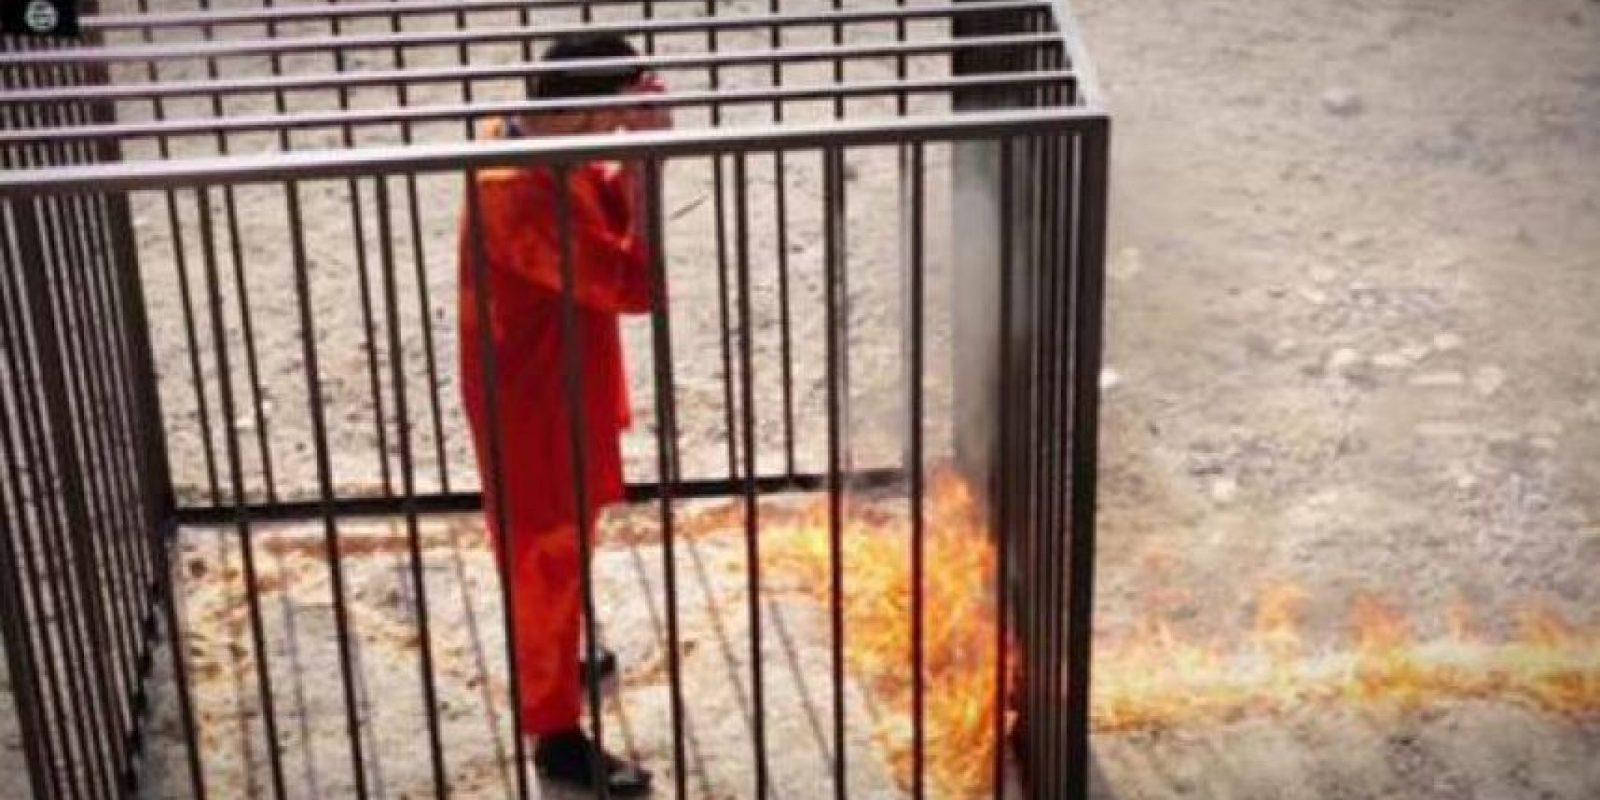 El piloto jordano Muaz Kasasbeh, quemado vivo por el grupo yihadista Foto:Twitter